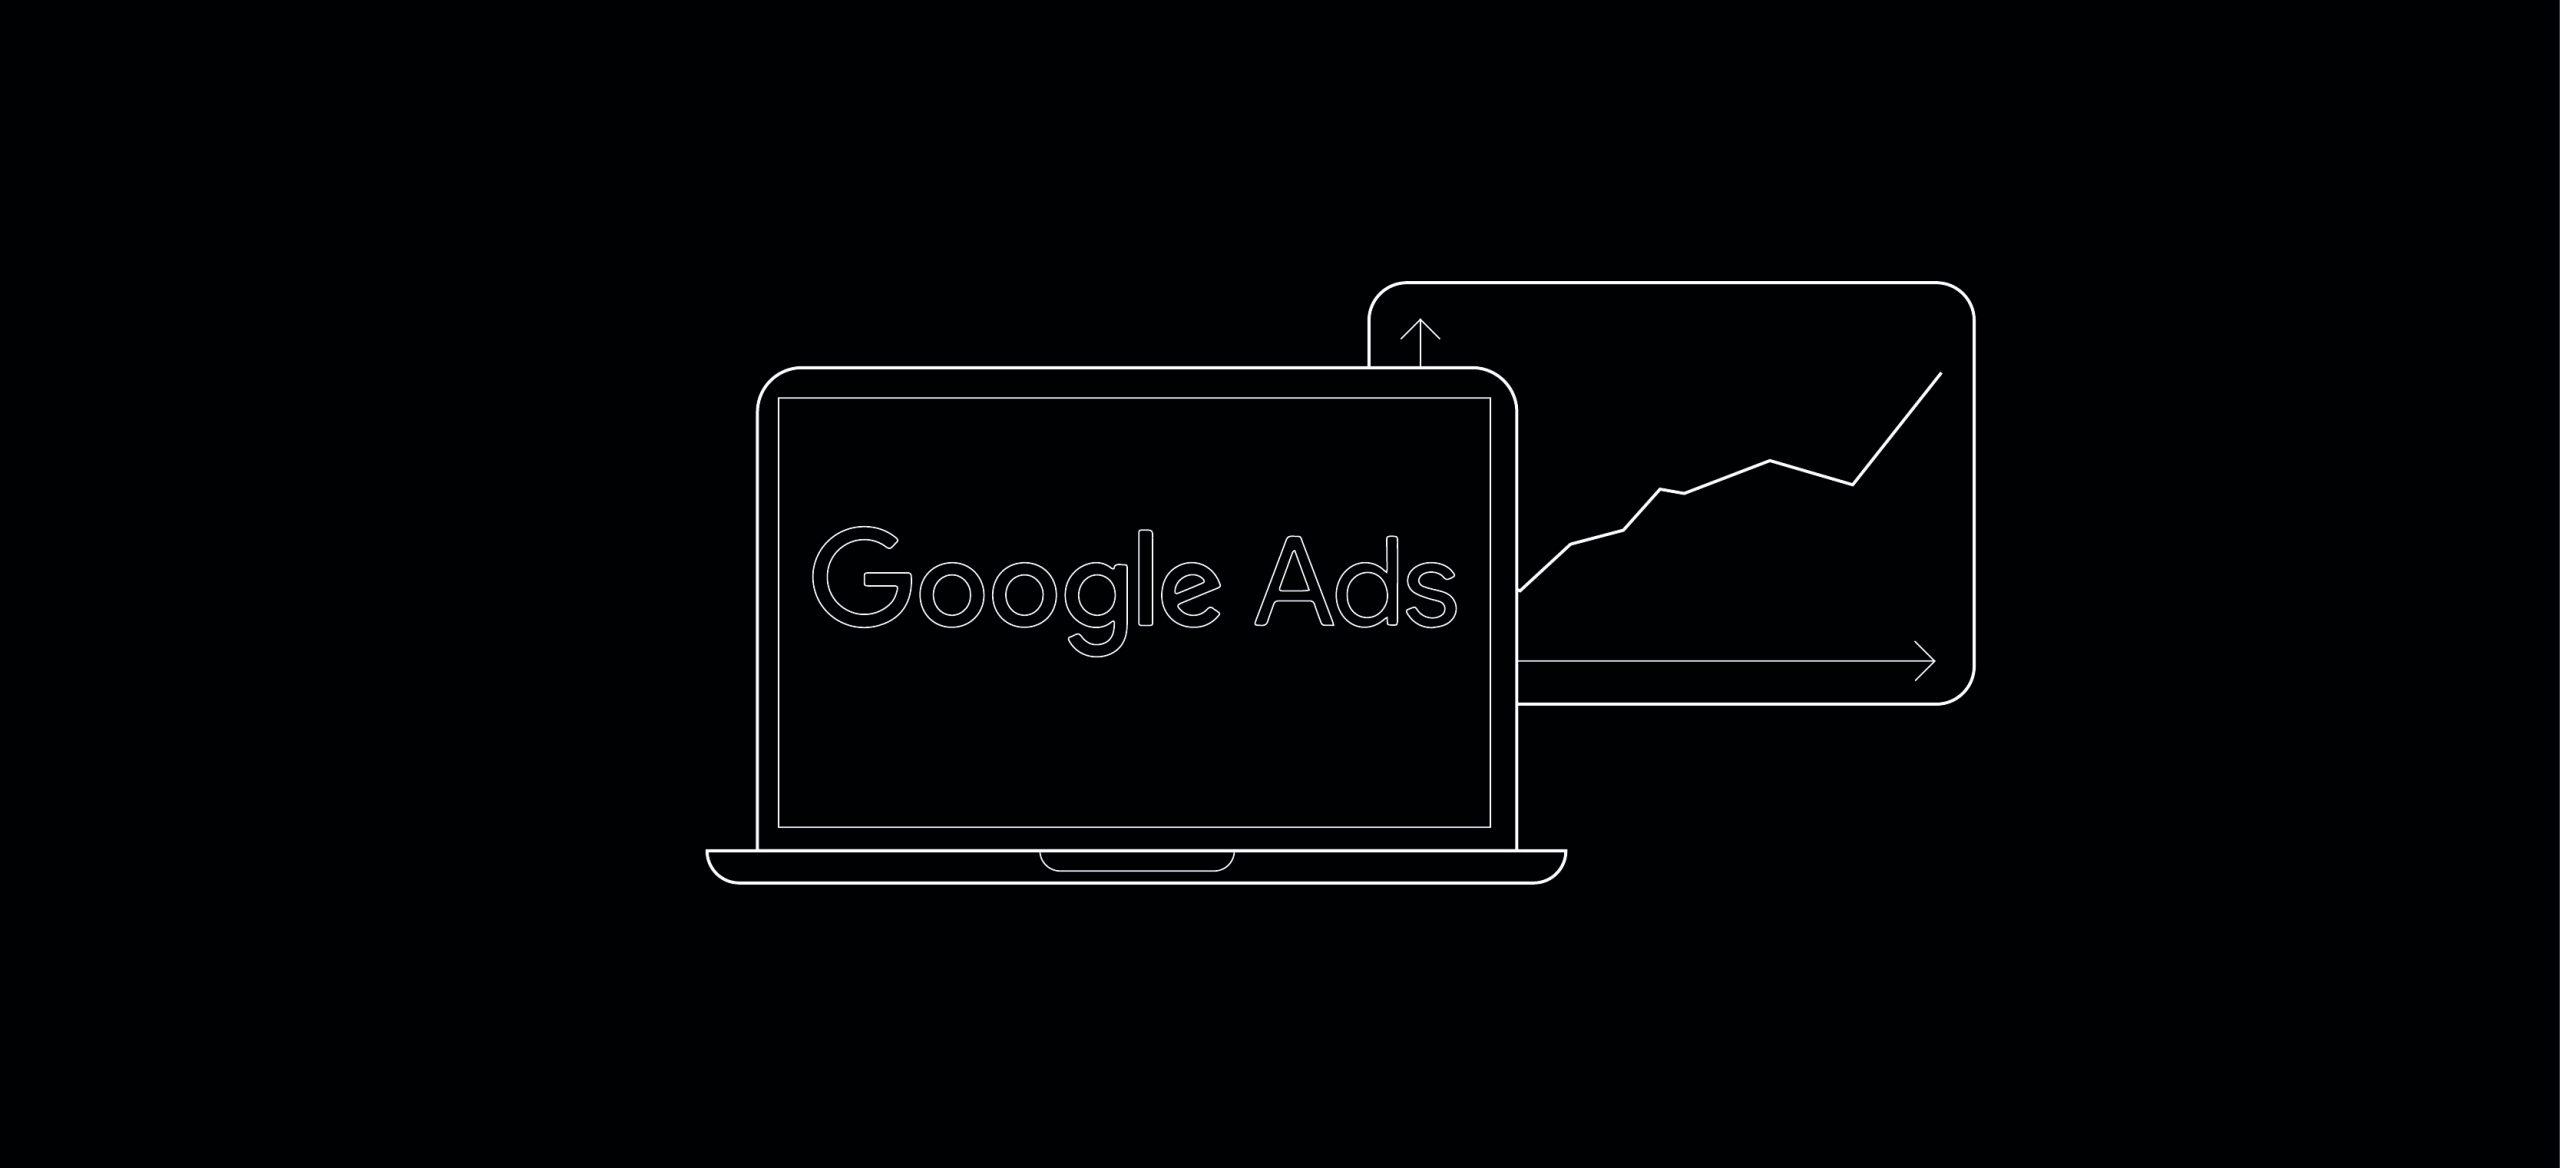 google-ads-reklam-vermek